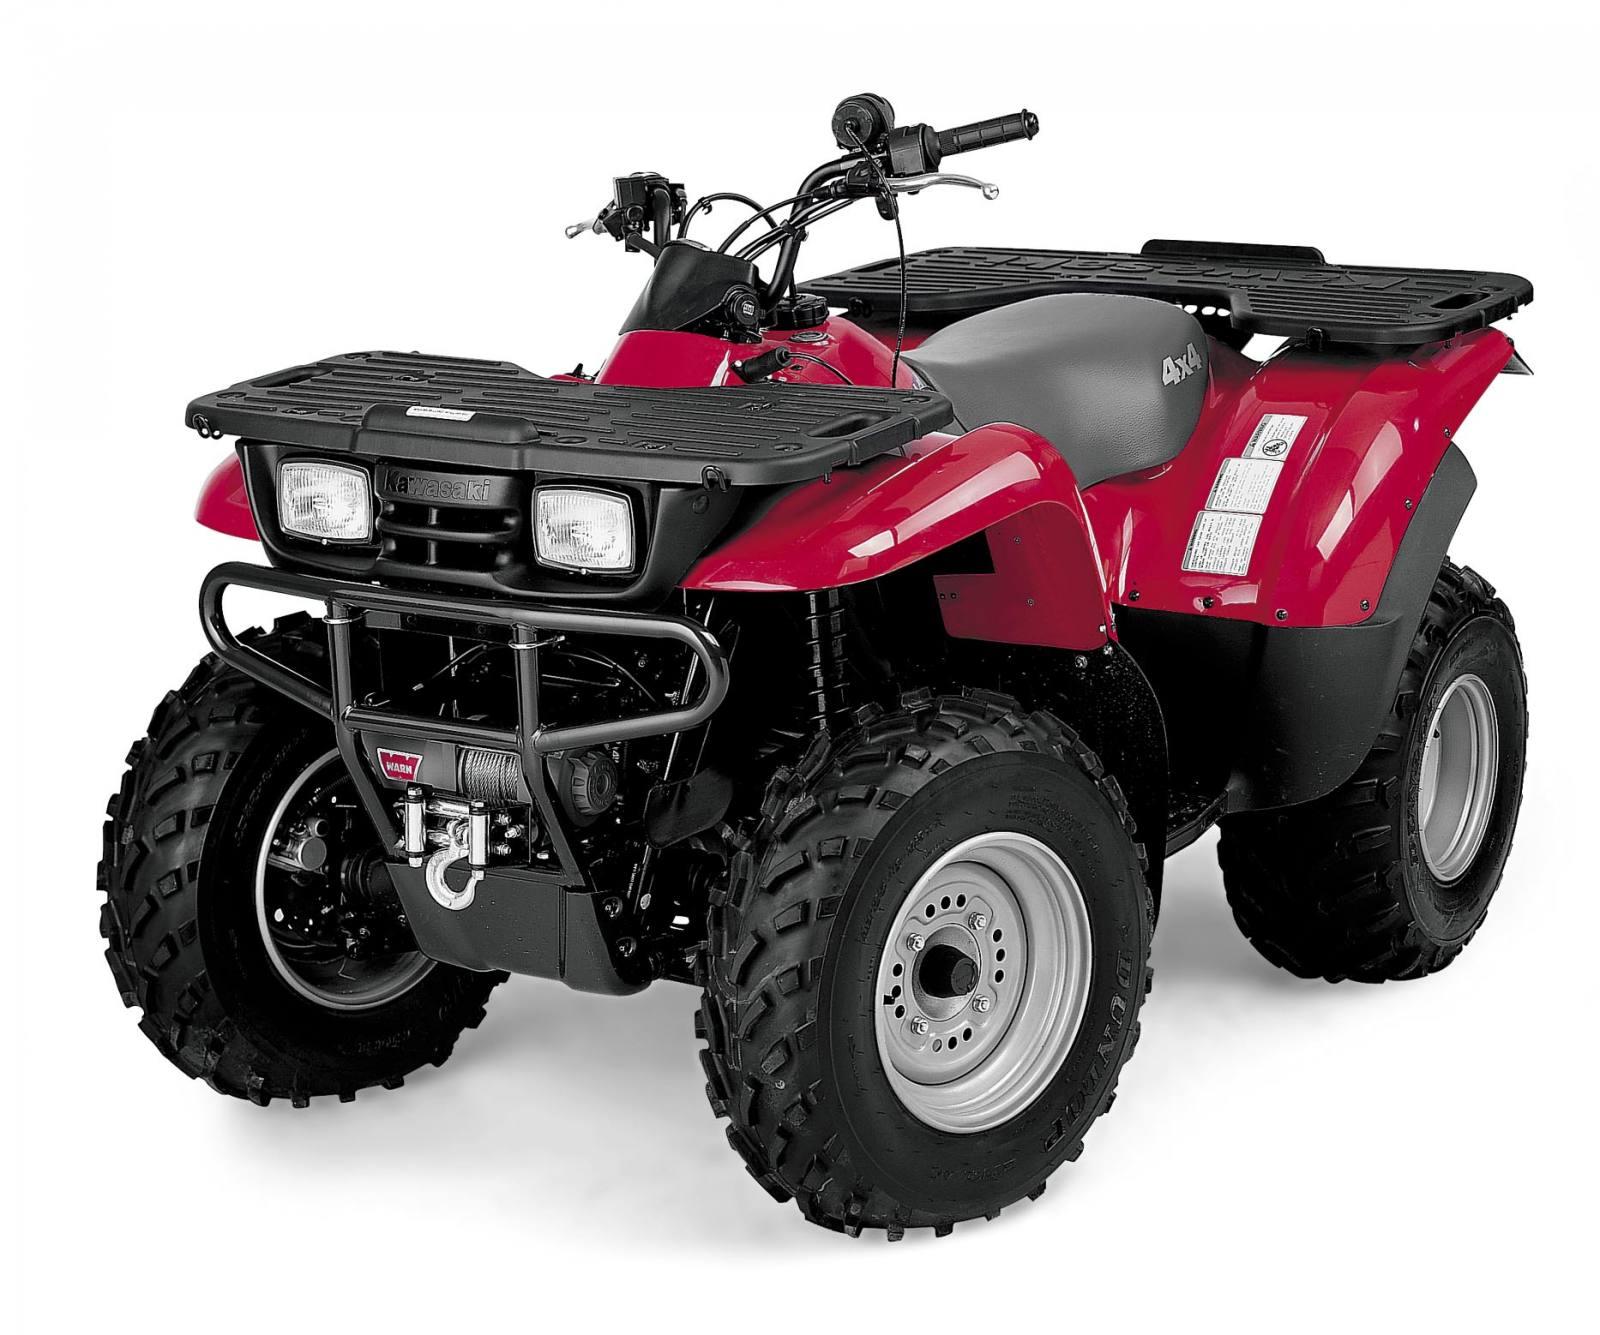 83405 Winch Mounting System Honda Big Red 700  Warn